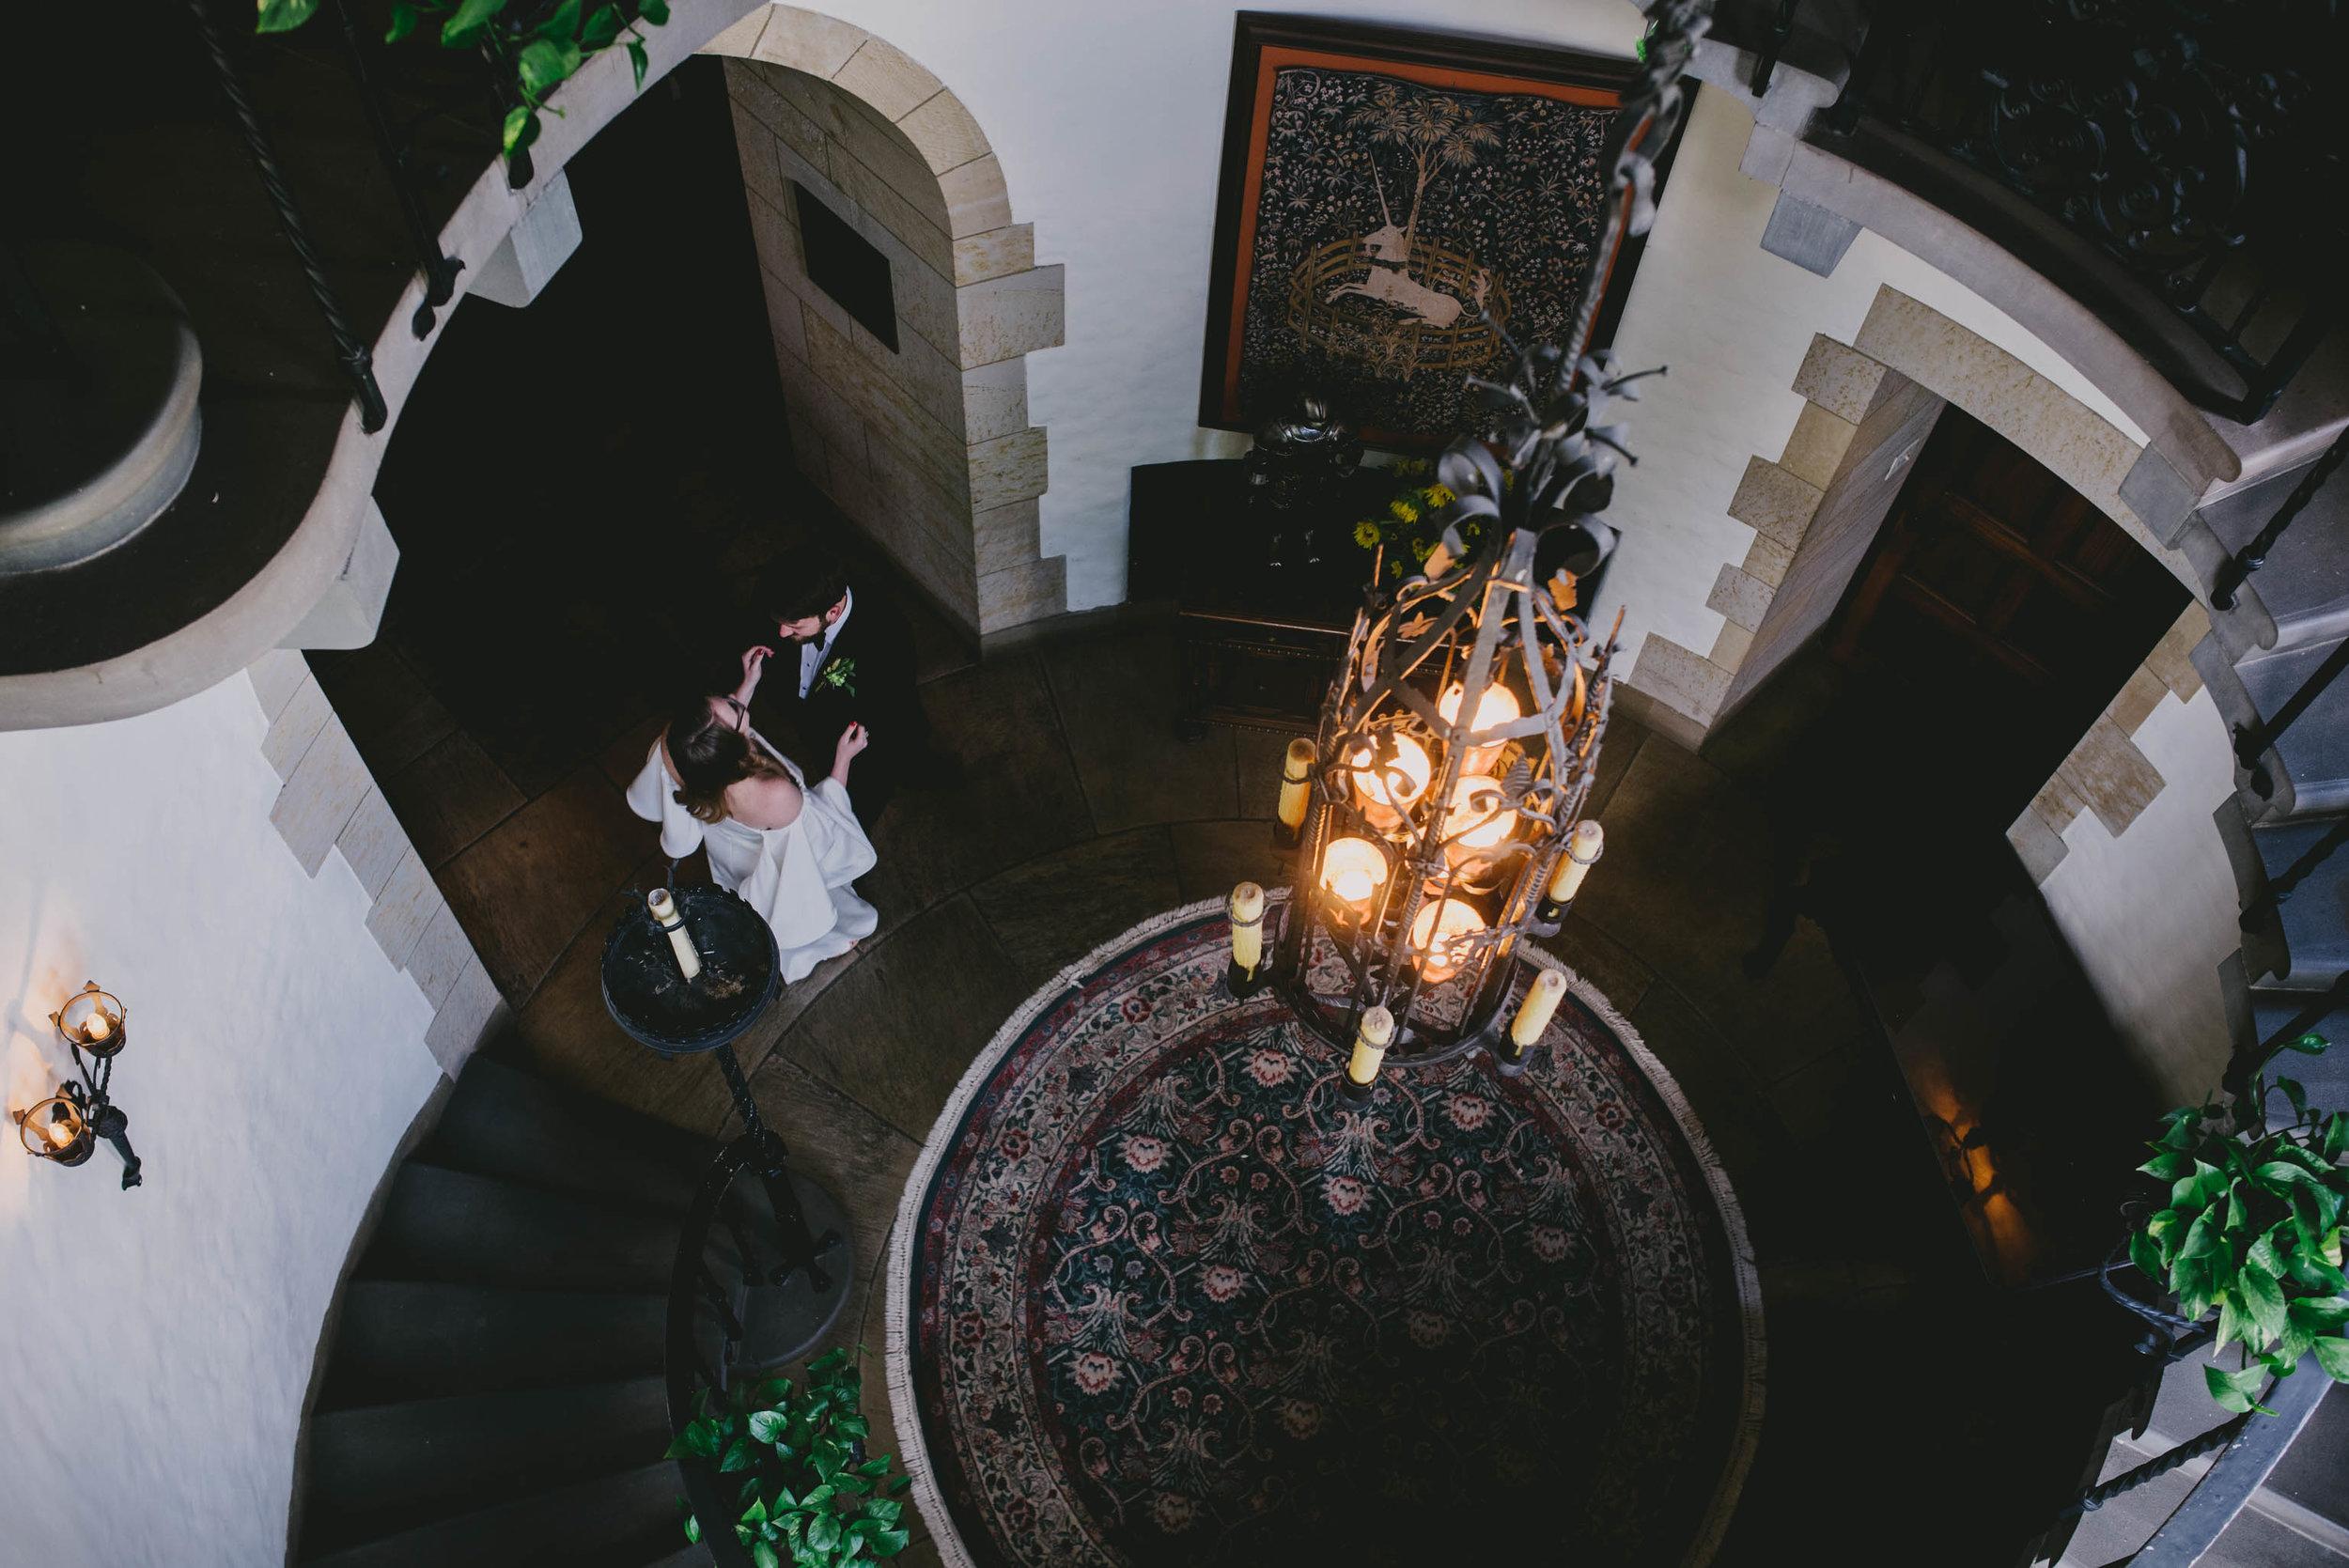 enchanted-garden-wedding-at-the-graylyn-estate-winston-salem.jpg